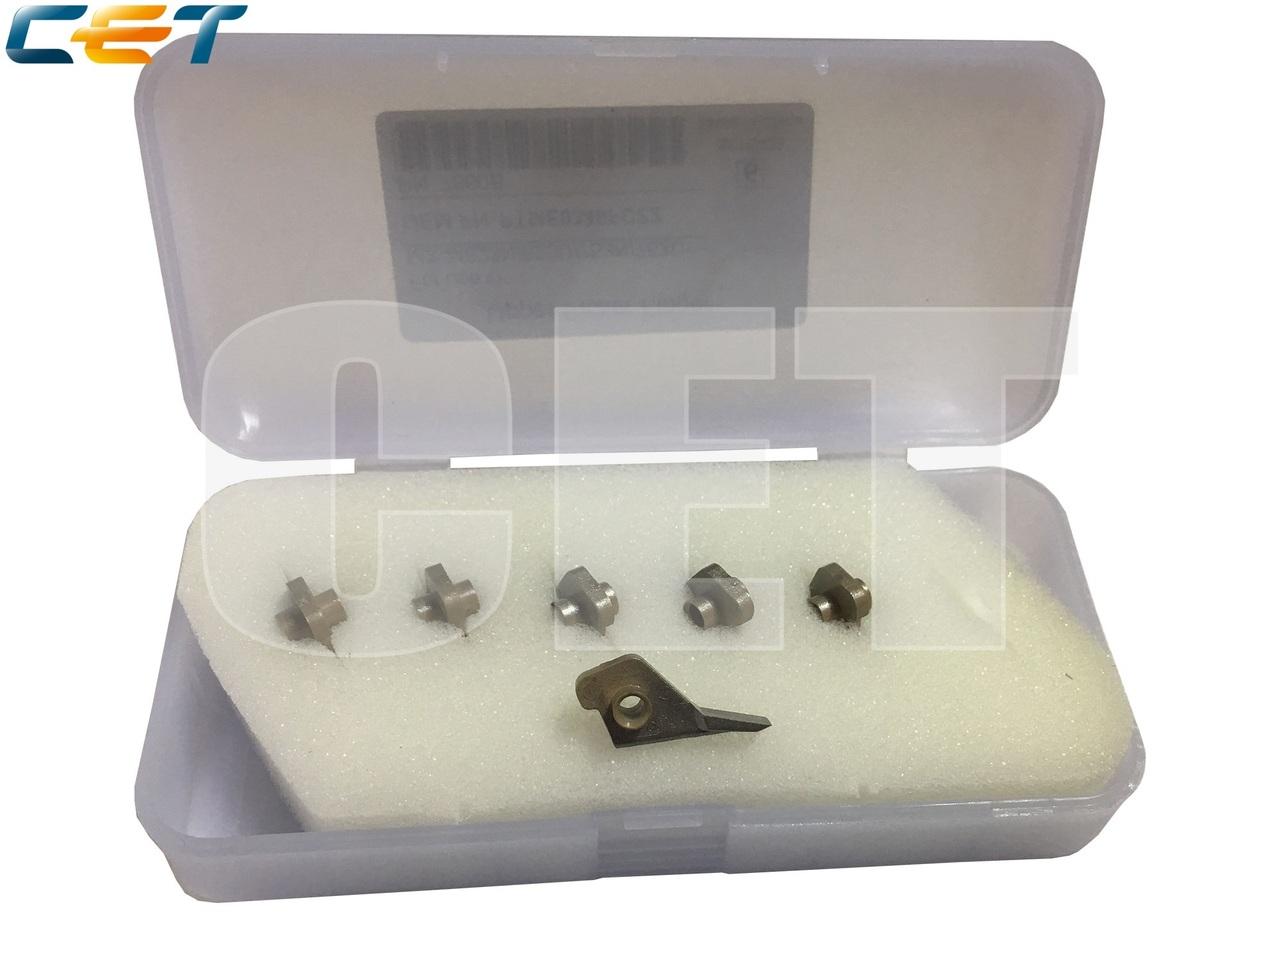 Сепаратор тефлонового вала PTME0346FCZZ для SHARPMX-M623N/M623U/M753N/M753U (CET), CET7660B